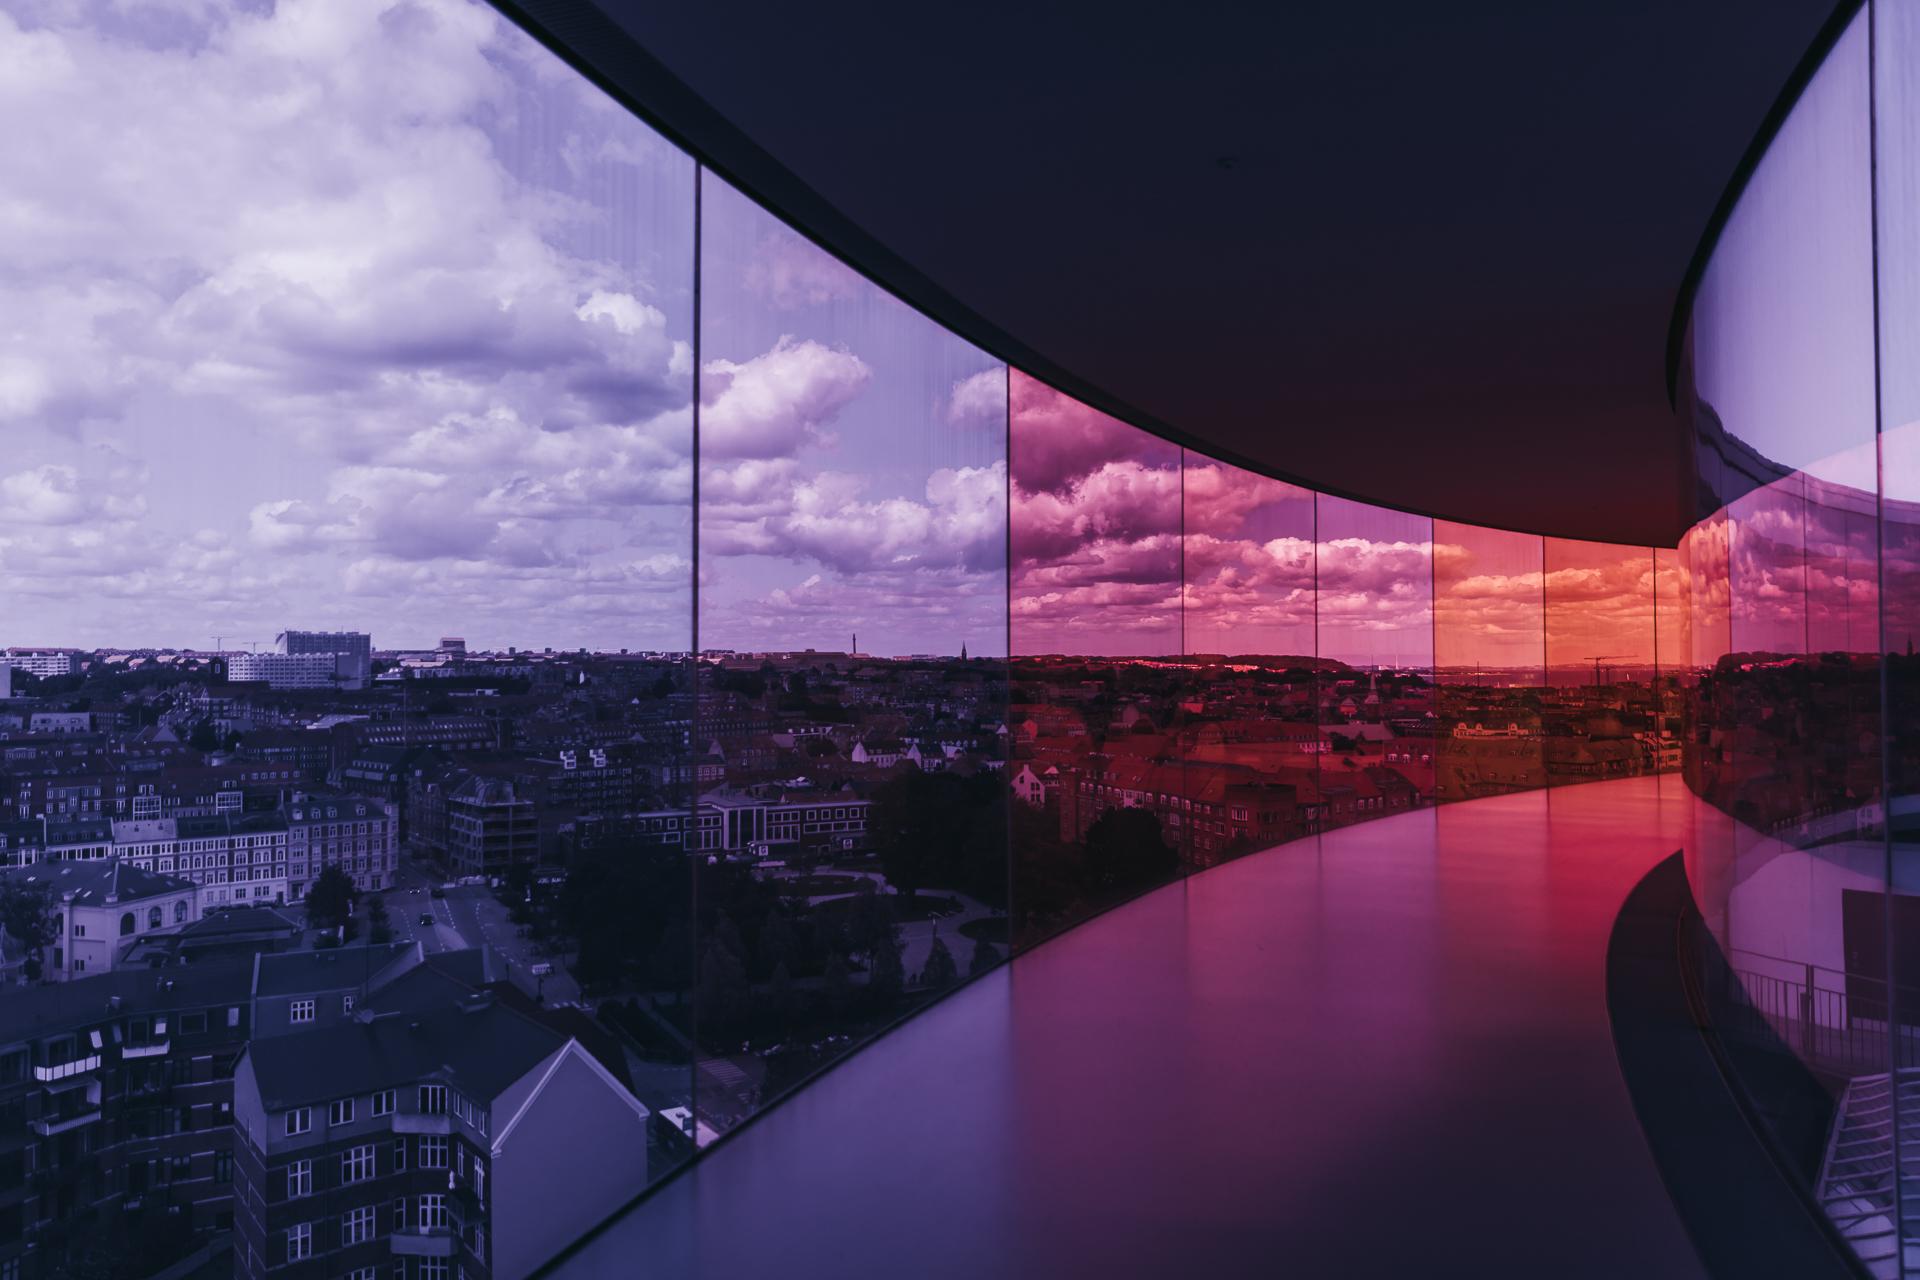 Sehenswürdigkeiten in Aarhus das Regenbogen Panorama auf dem Aros Kunstmuseum